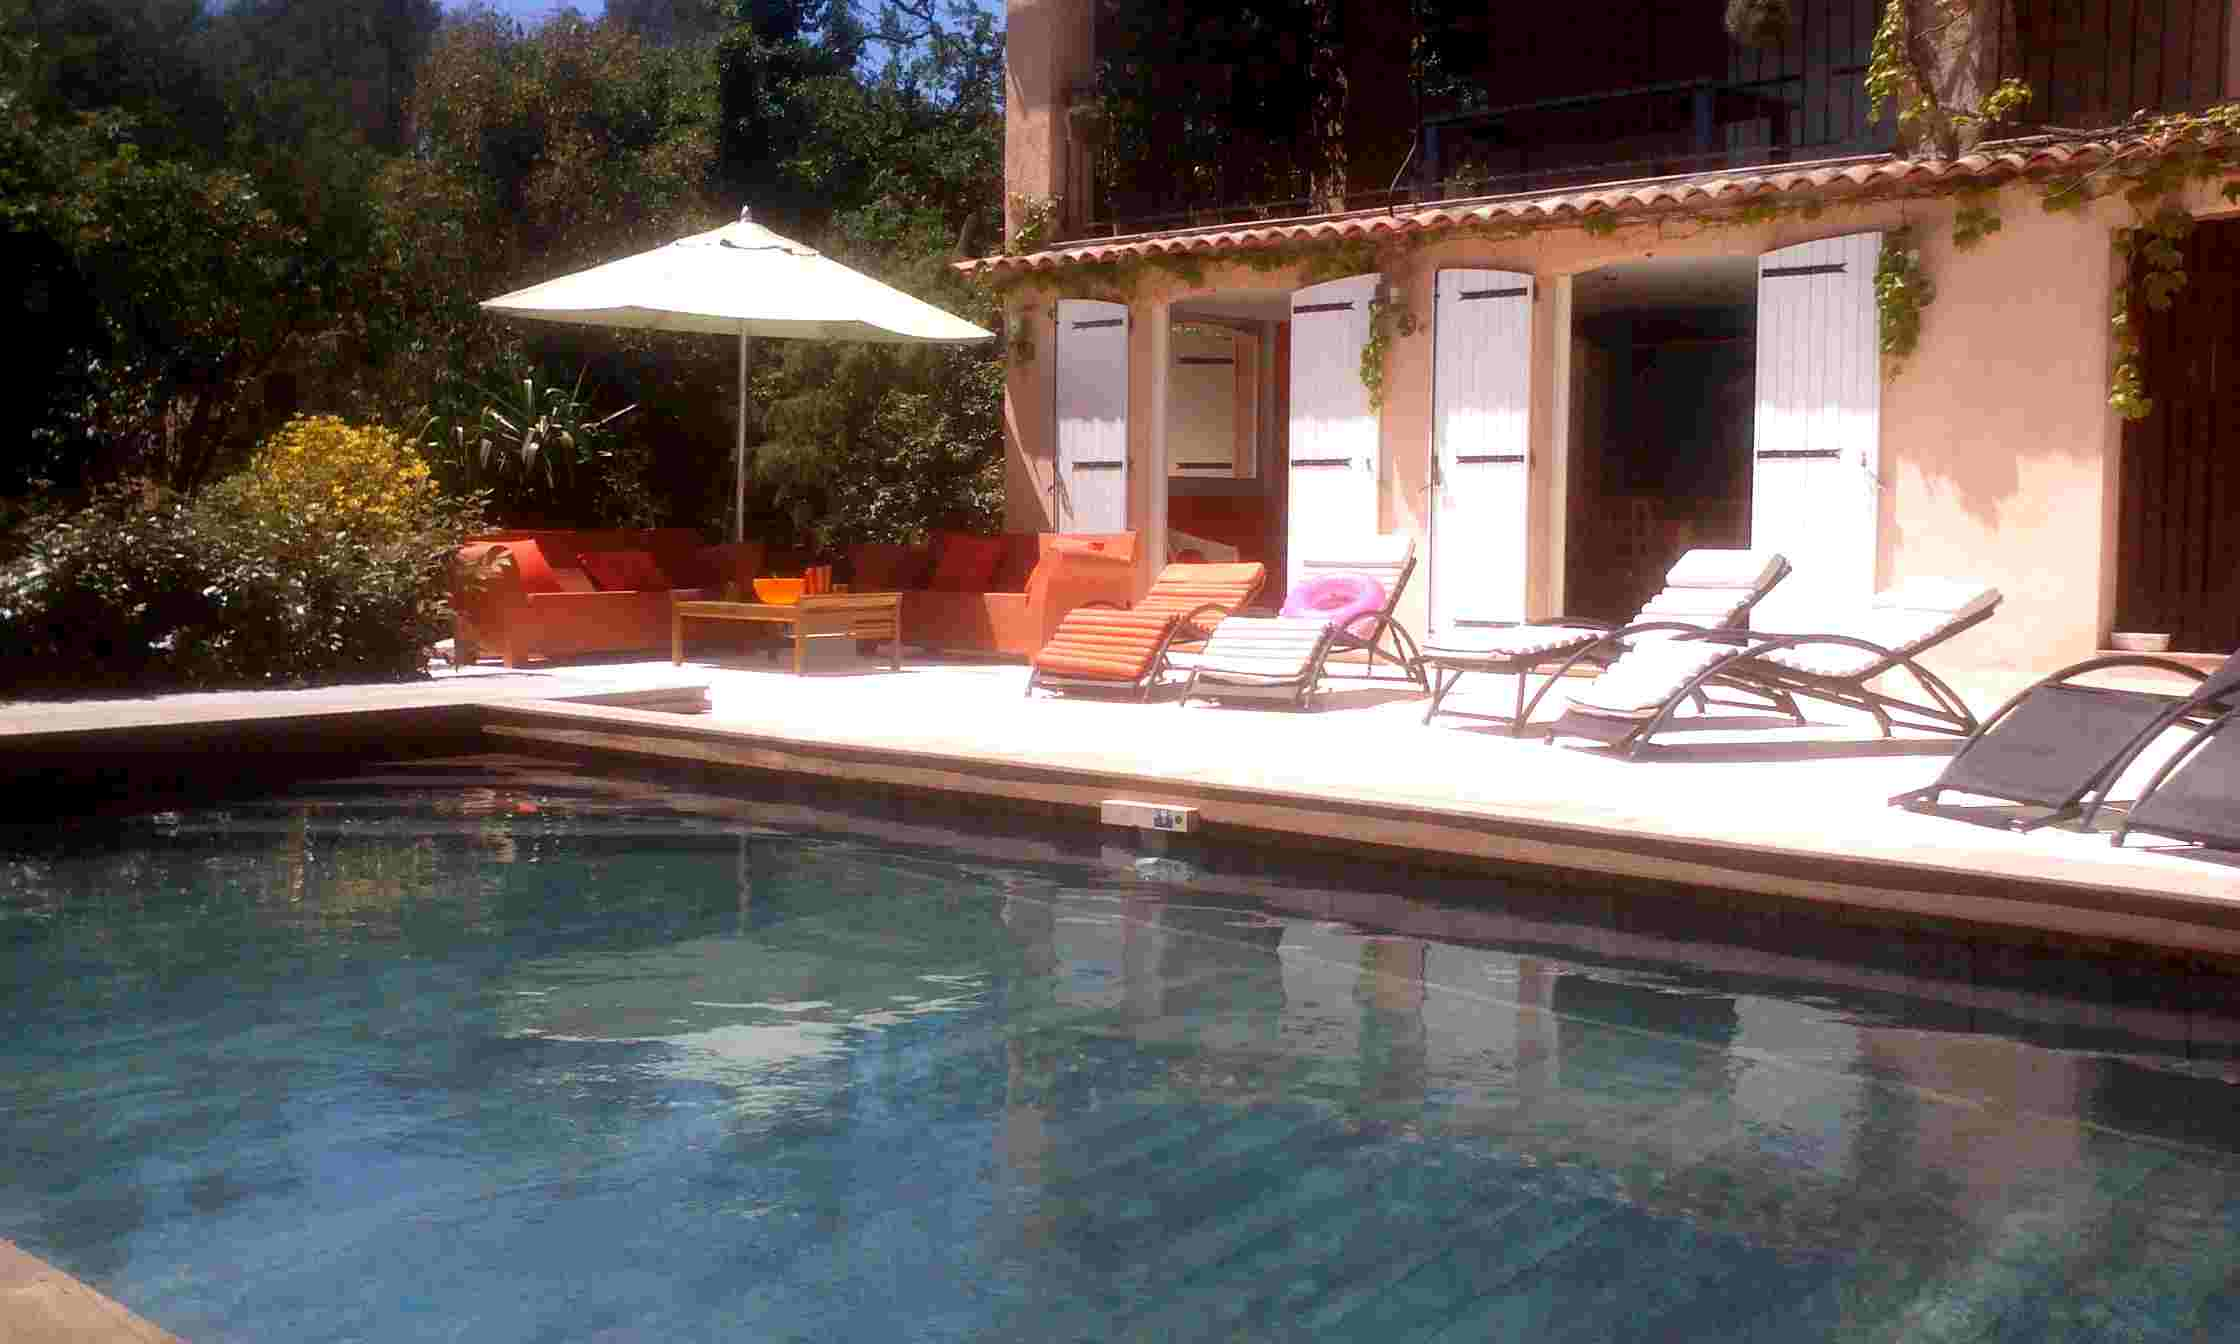 location villa vacances avec piscine prive saint raphael varlocation villa vacances avec piscine - Location Maison Vacances Piscine Prive